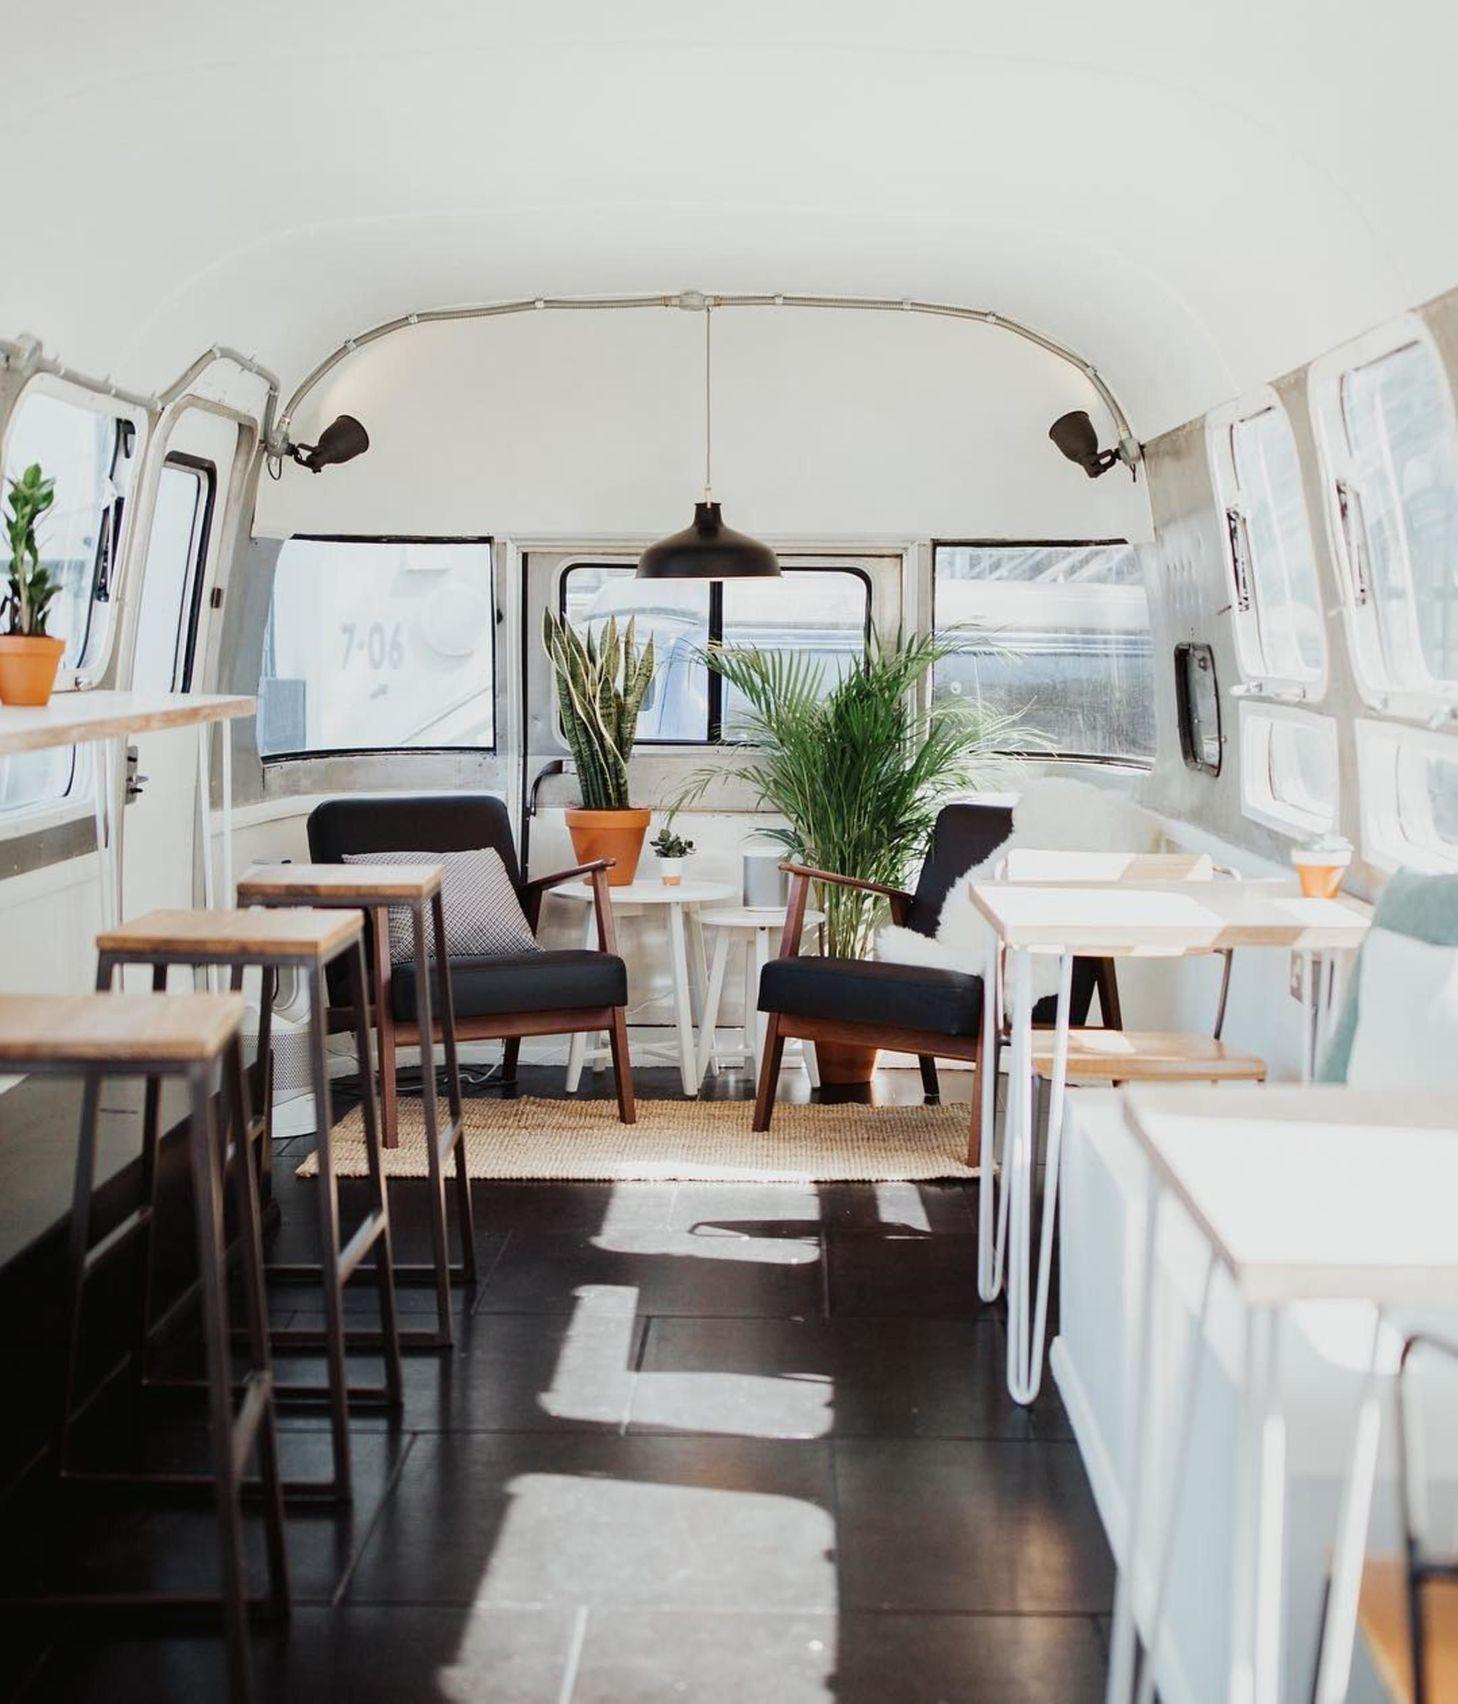 Airstream Caravans, Convoy Espresso